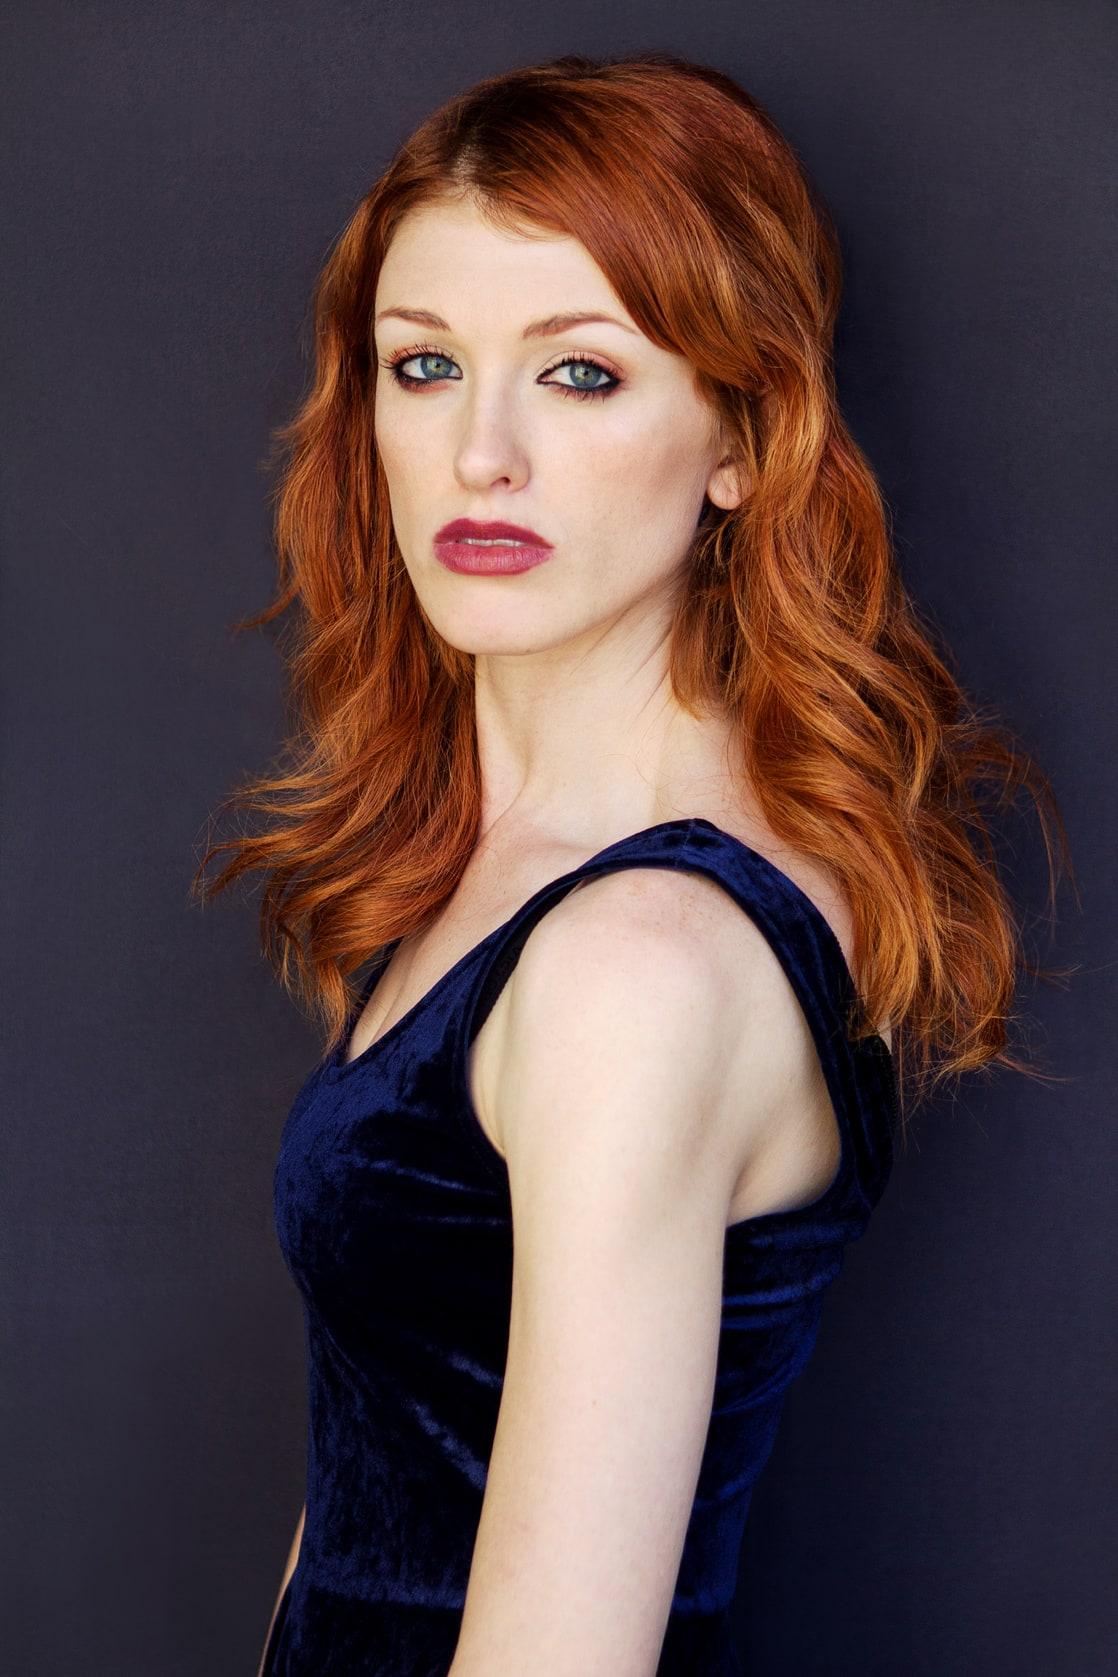 Virginia Petrucci